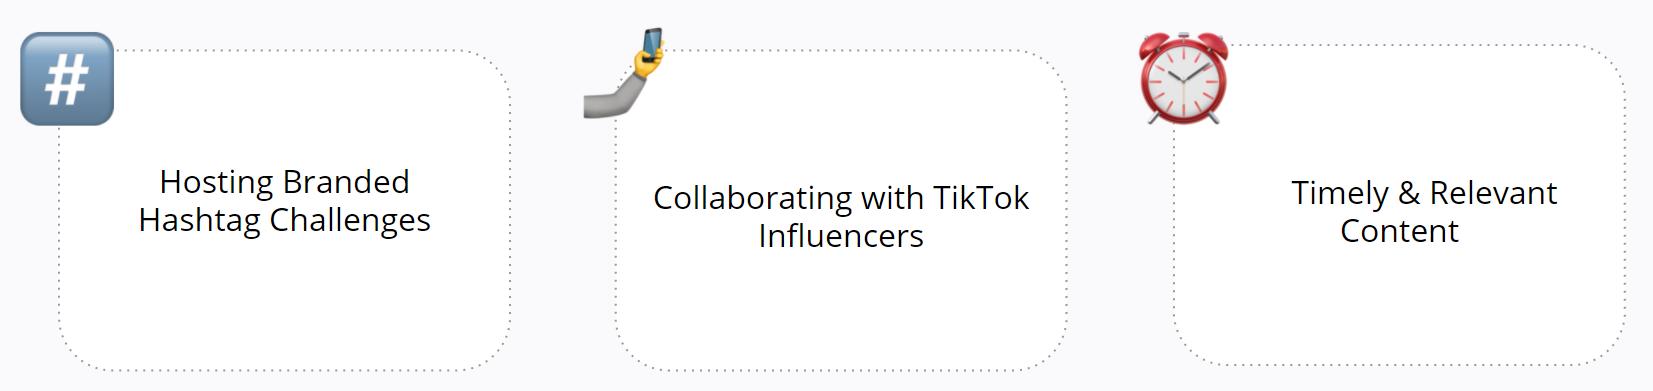 TikTok - 3 Ways on How Chipotle Raises Brand Awareness on TikTok